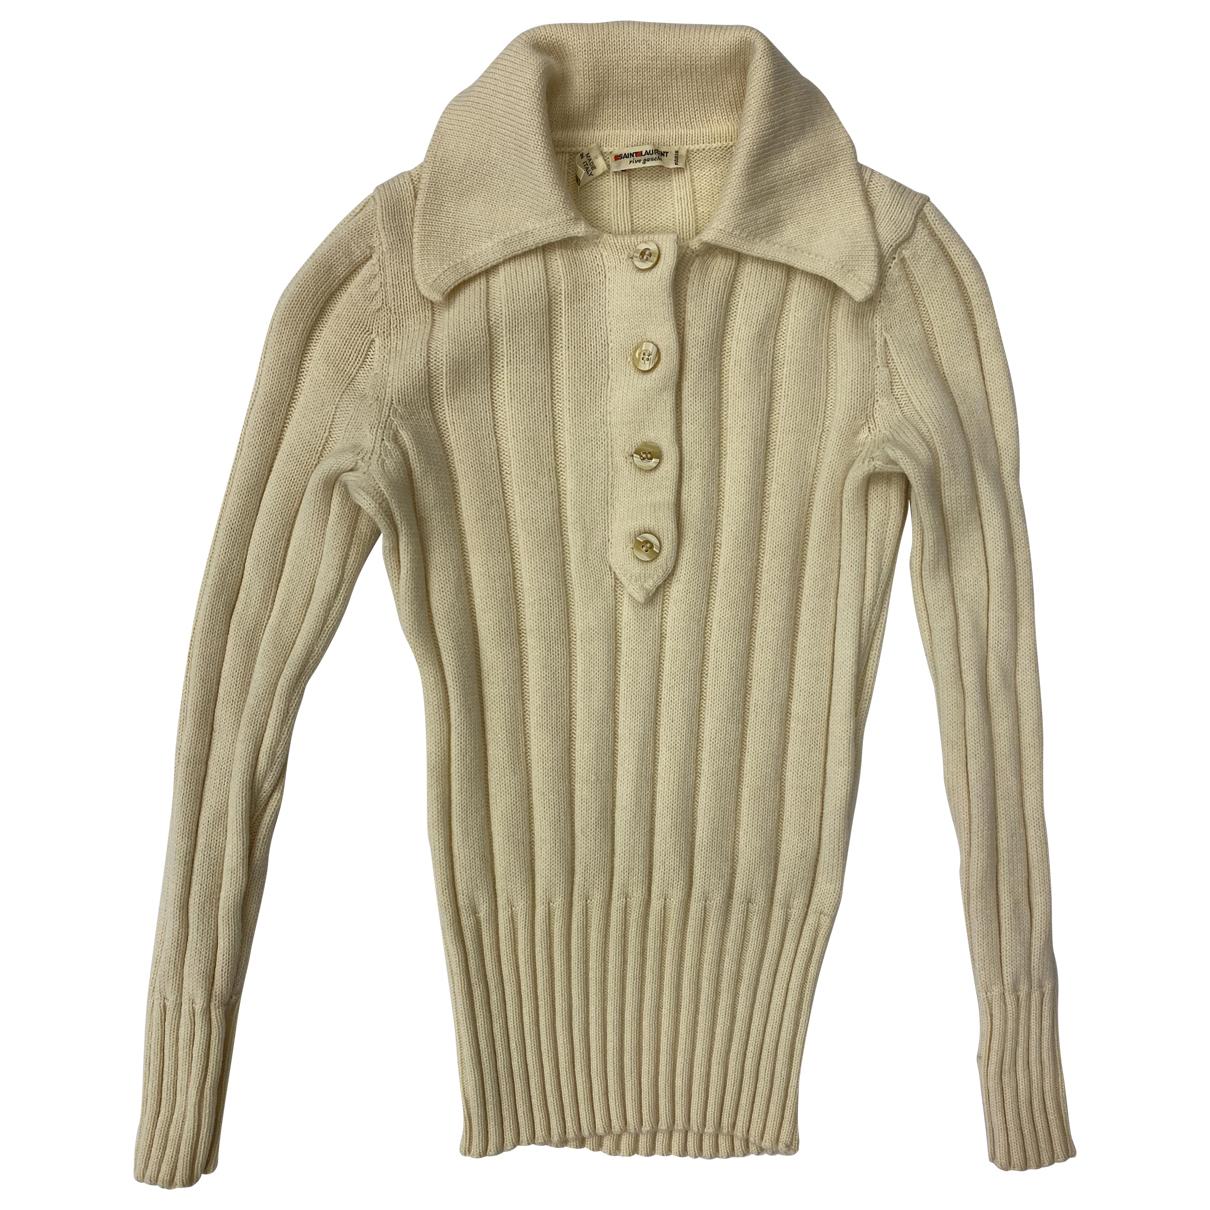 Yves Saint Laurent N White Wool Knitwear for Women XS International